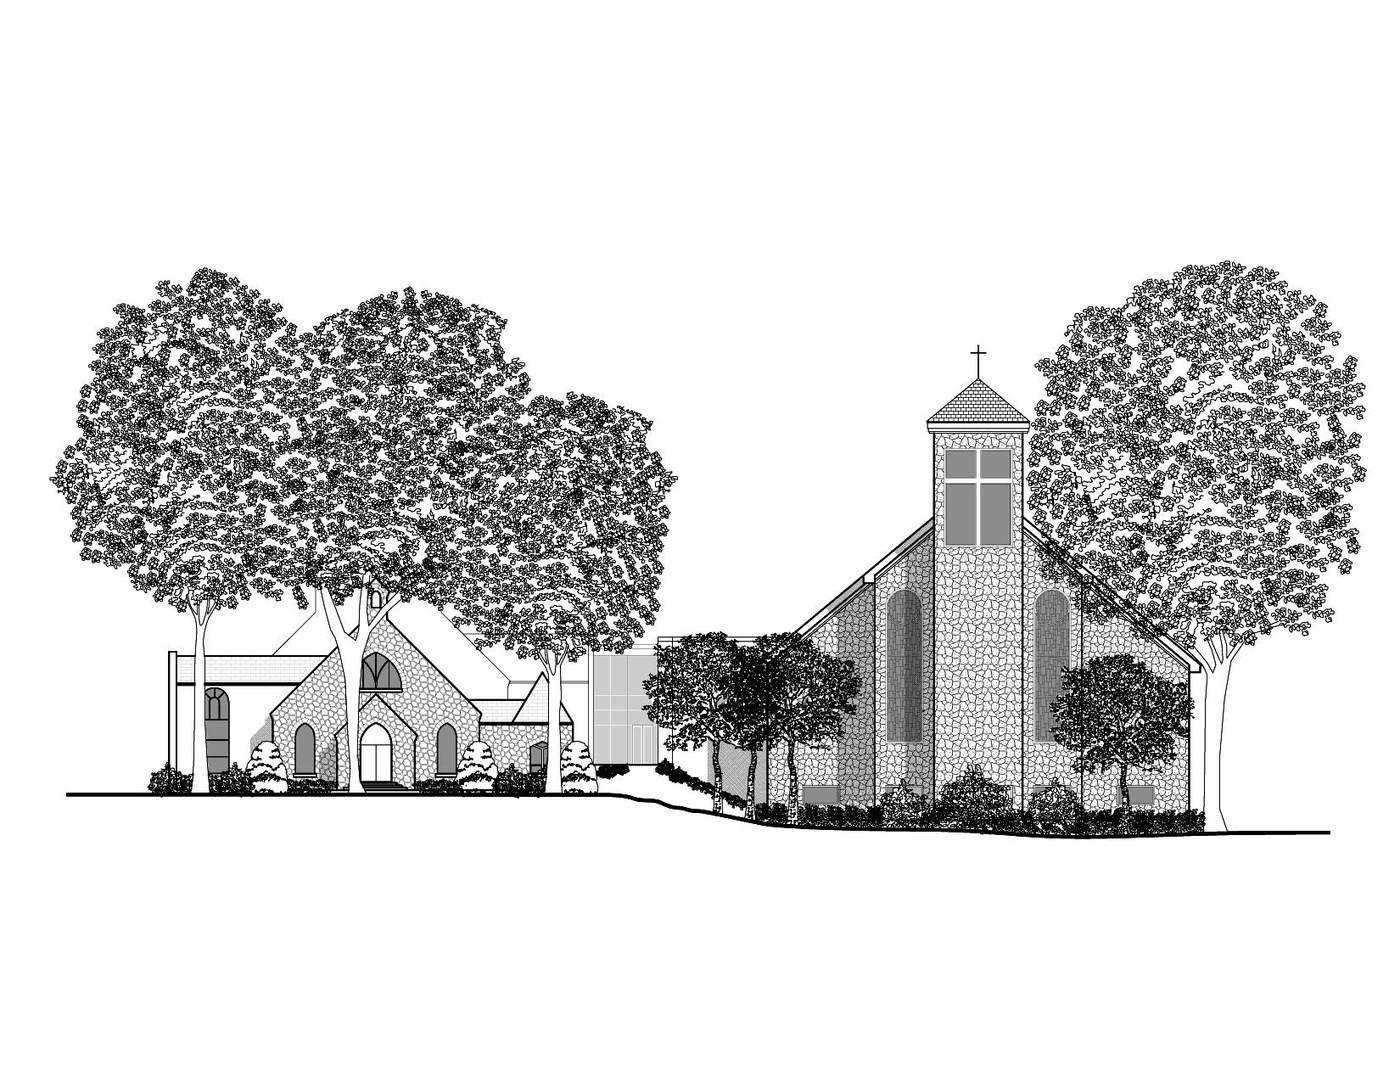 Covenant United Presbyterian Church Malvern PA by James Feucht at ...